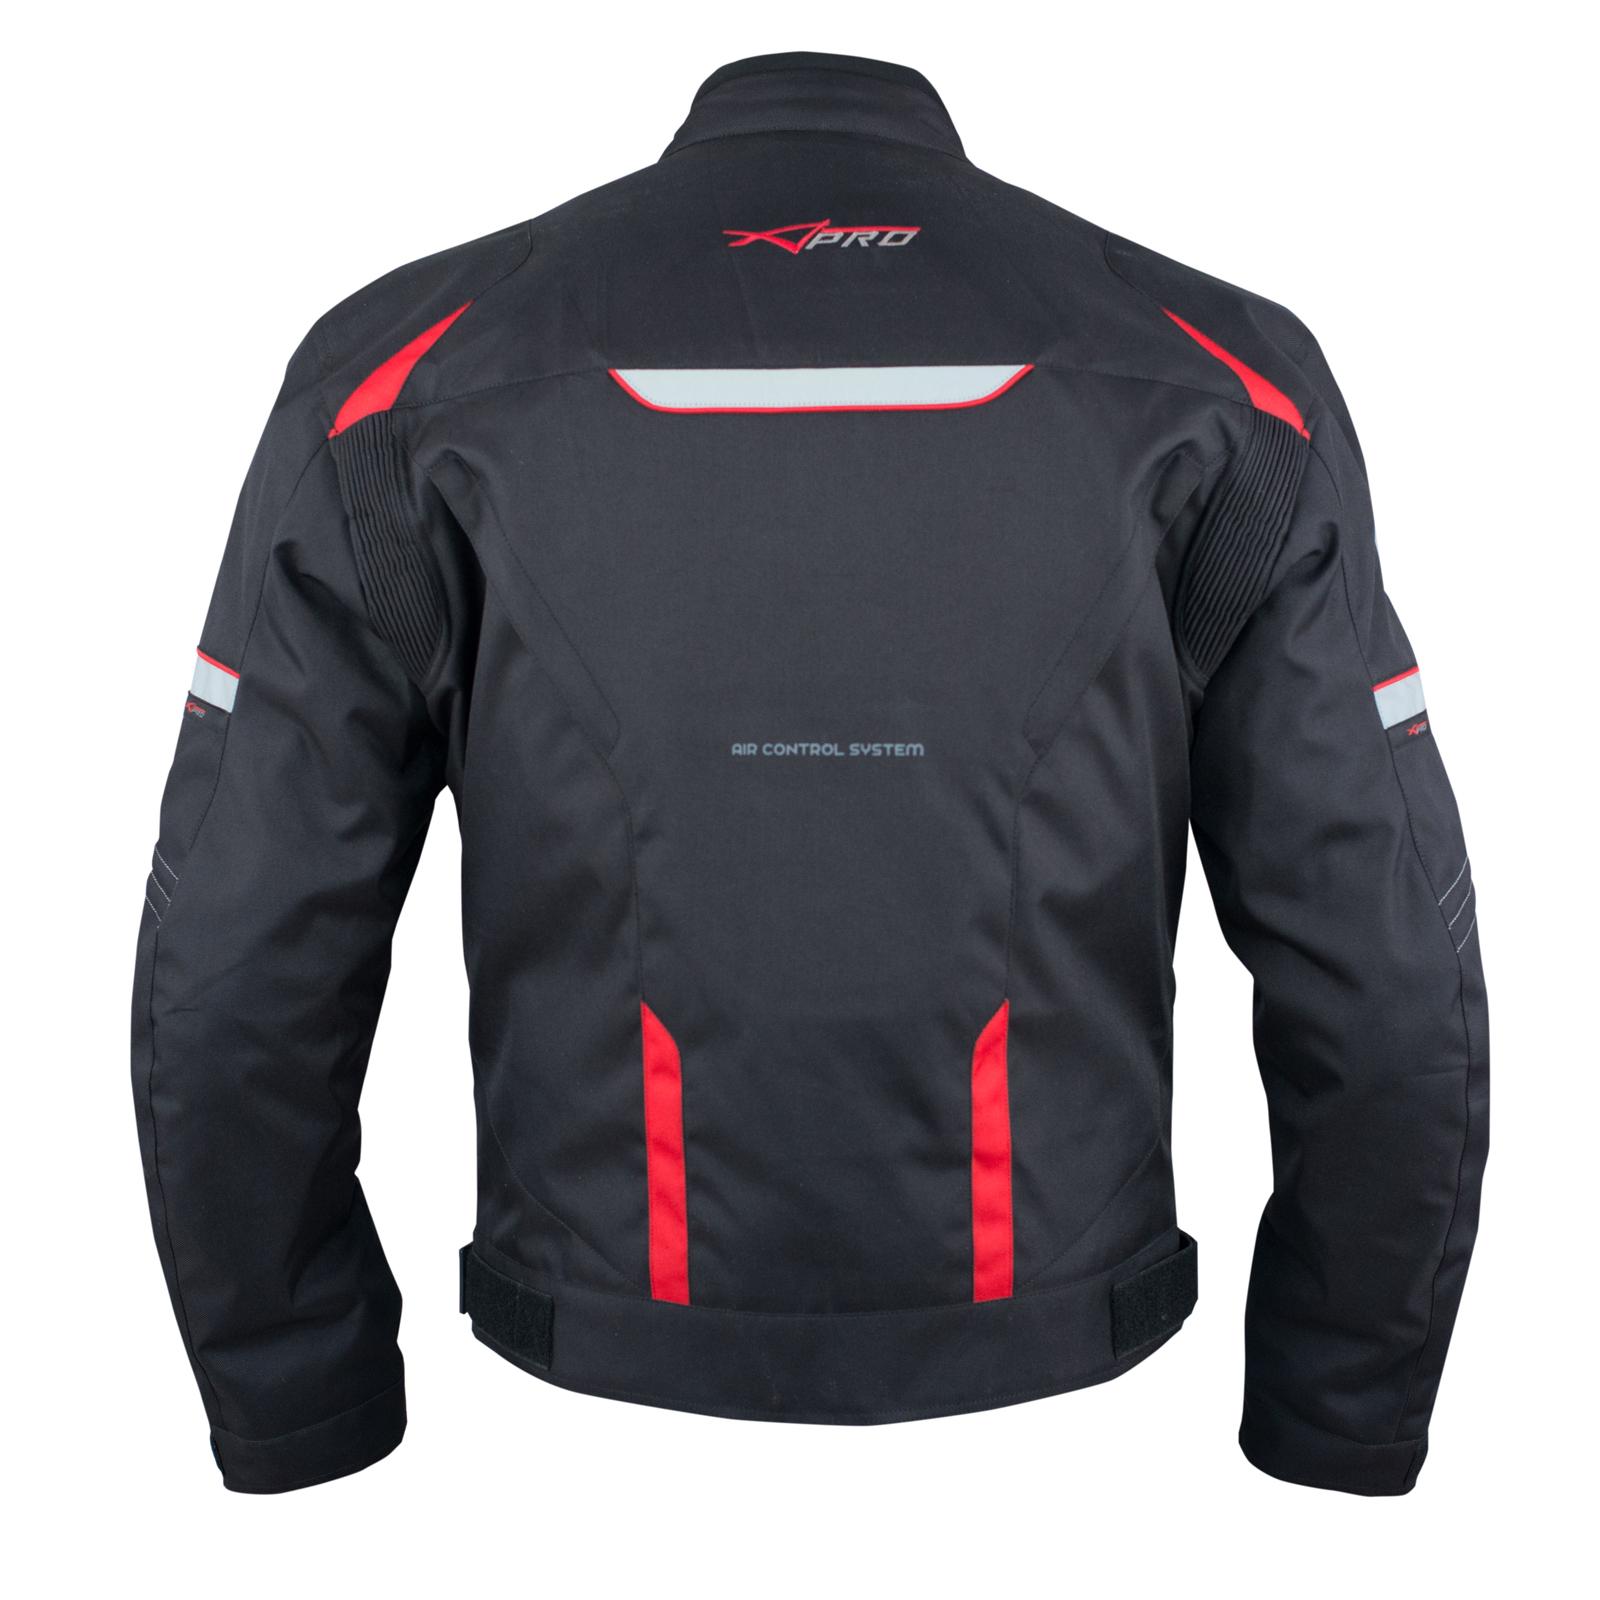 Giacca-Moto-Sport-Tessuto-Protezioni-CE-Impermeabile-Ventilata-Regolabile